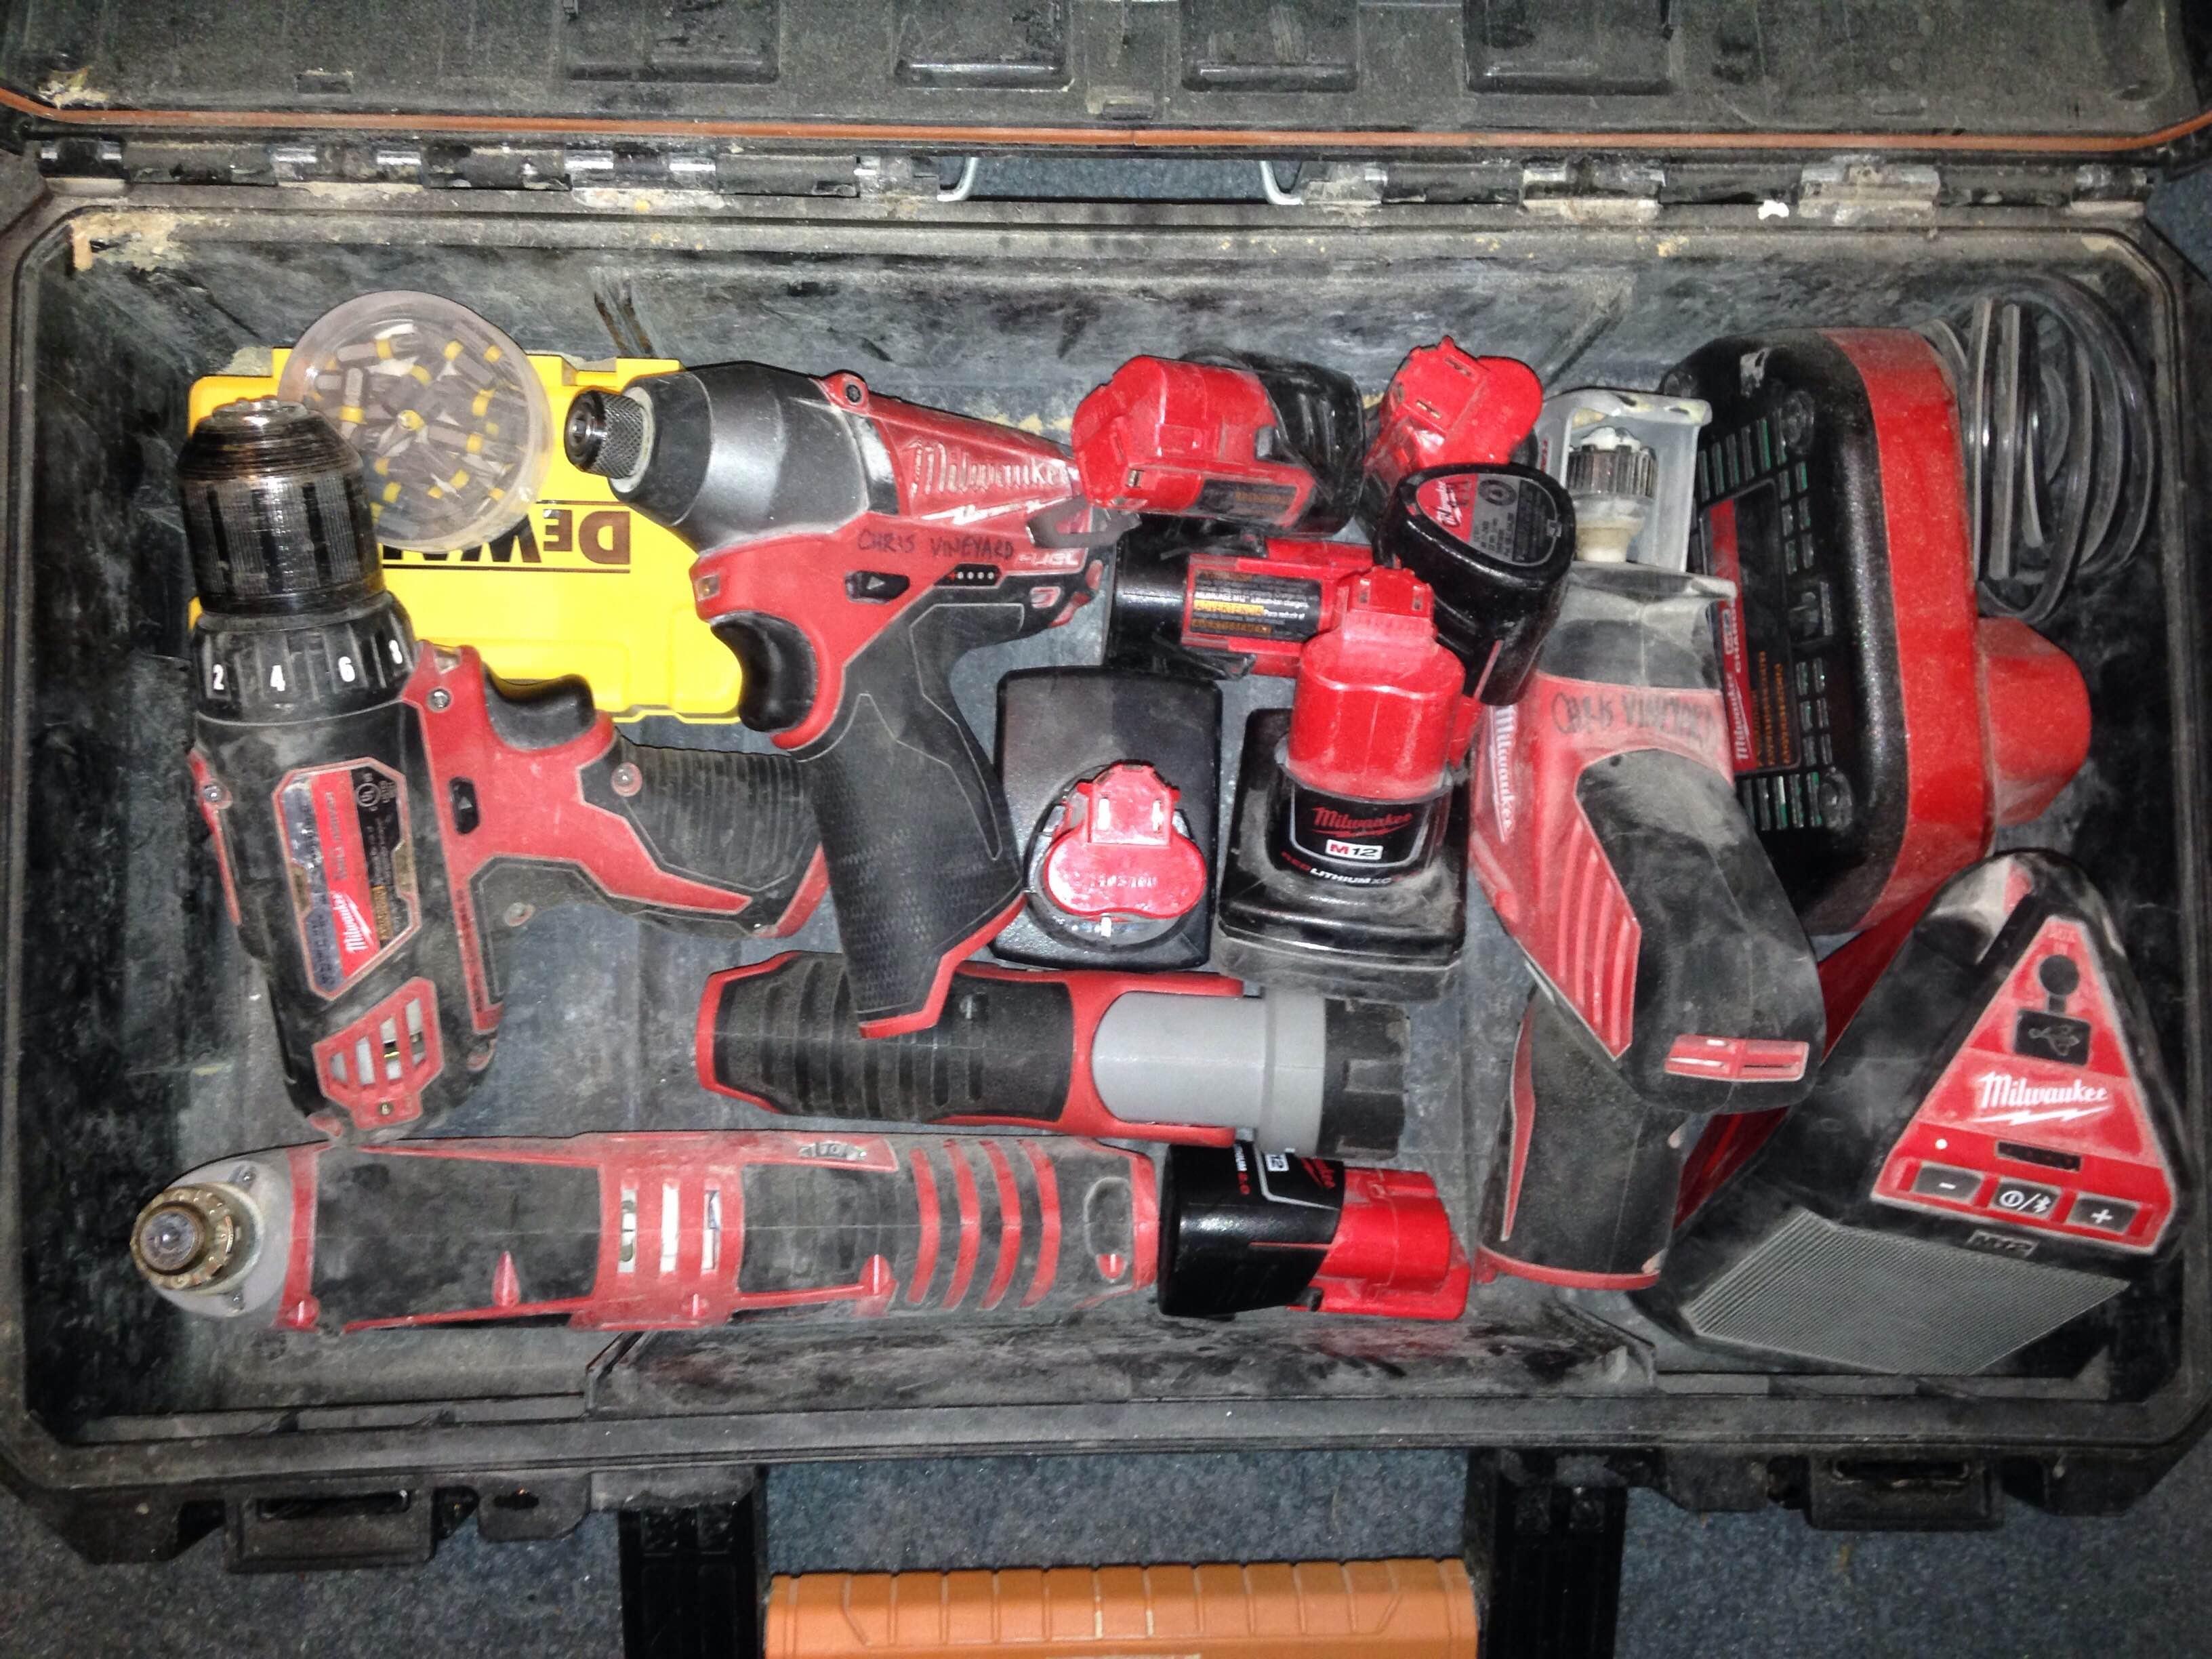 ridgid toolbox sale - page 3 - tools & equipment - contractor talk